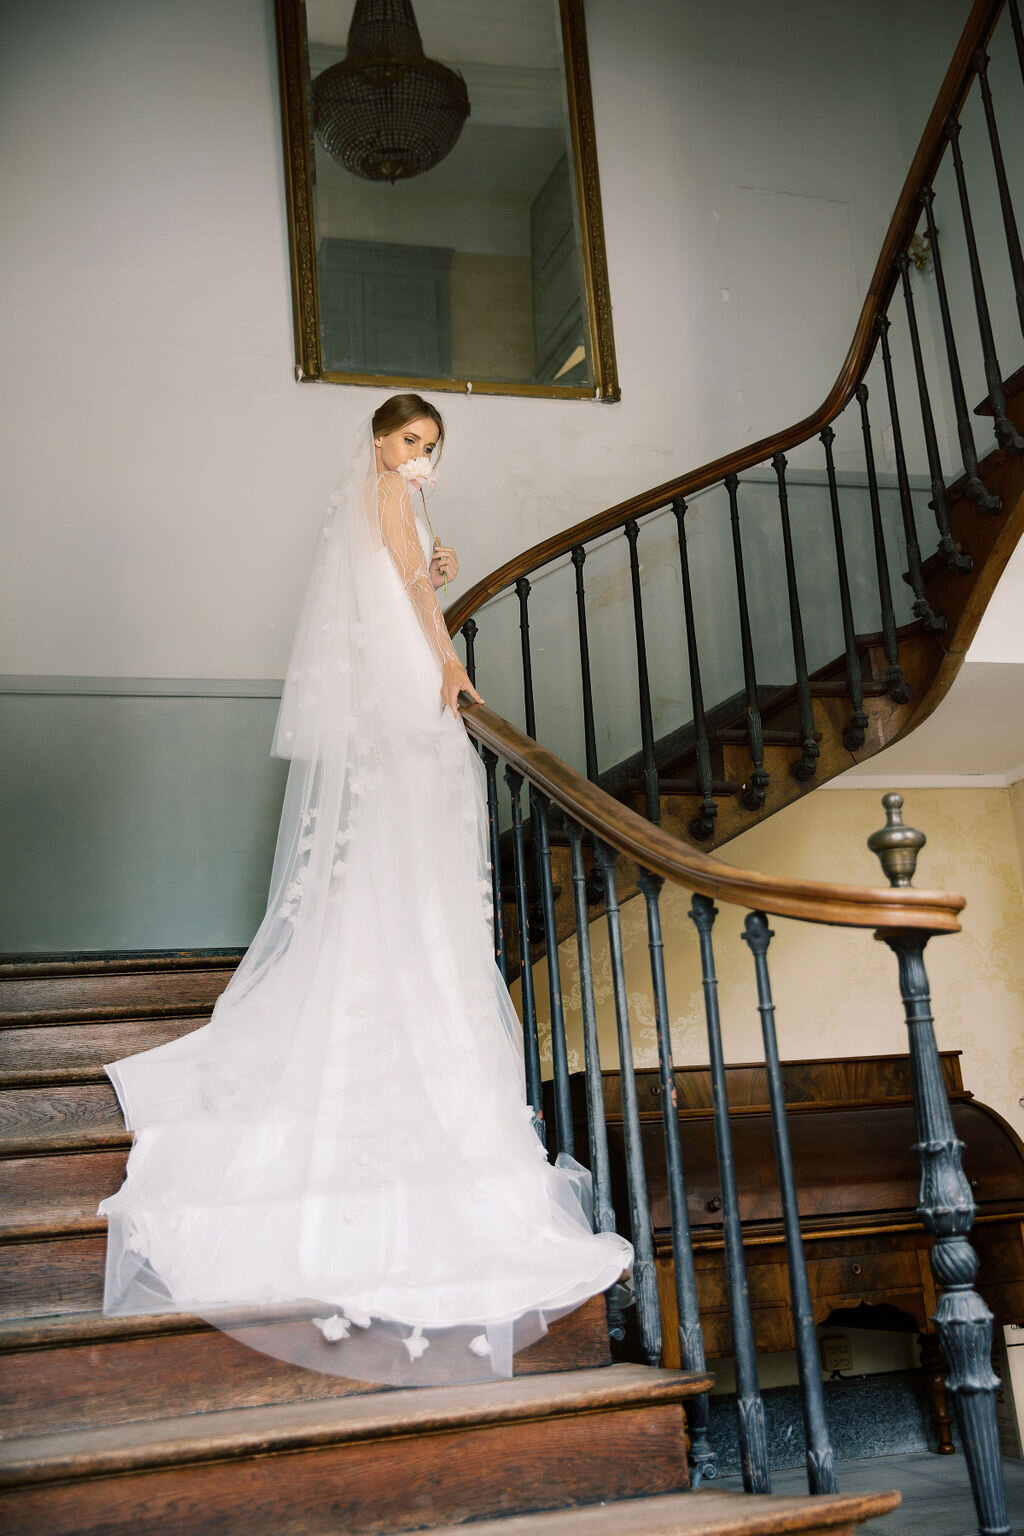 Wedding_Veil_Madame_Tulle_Amelia_Soegijono0159.JPG